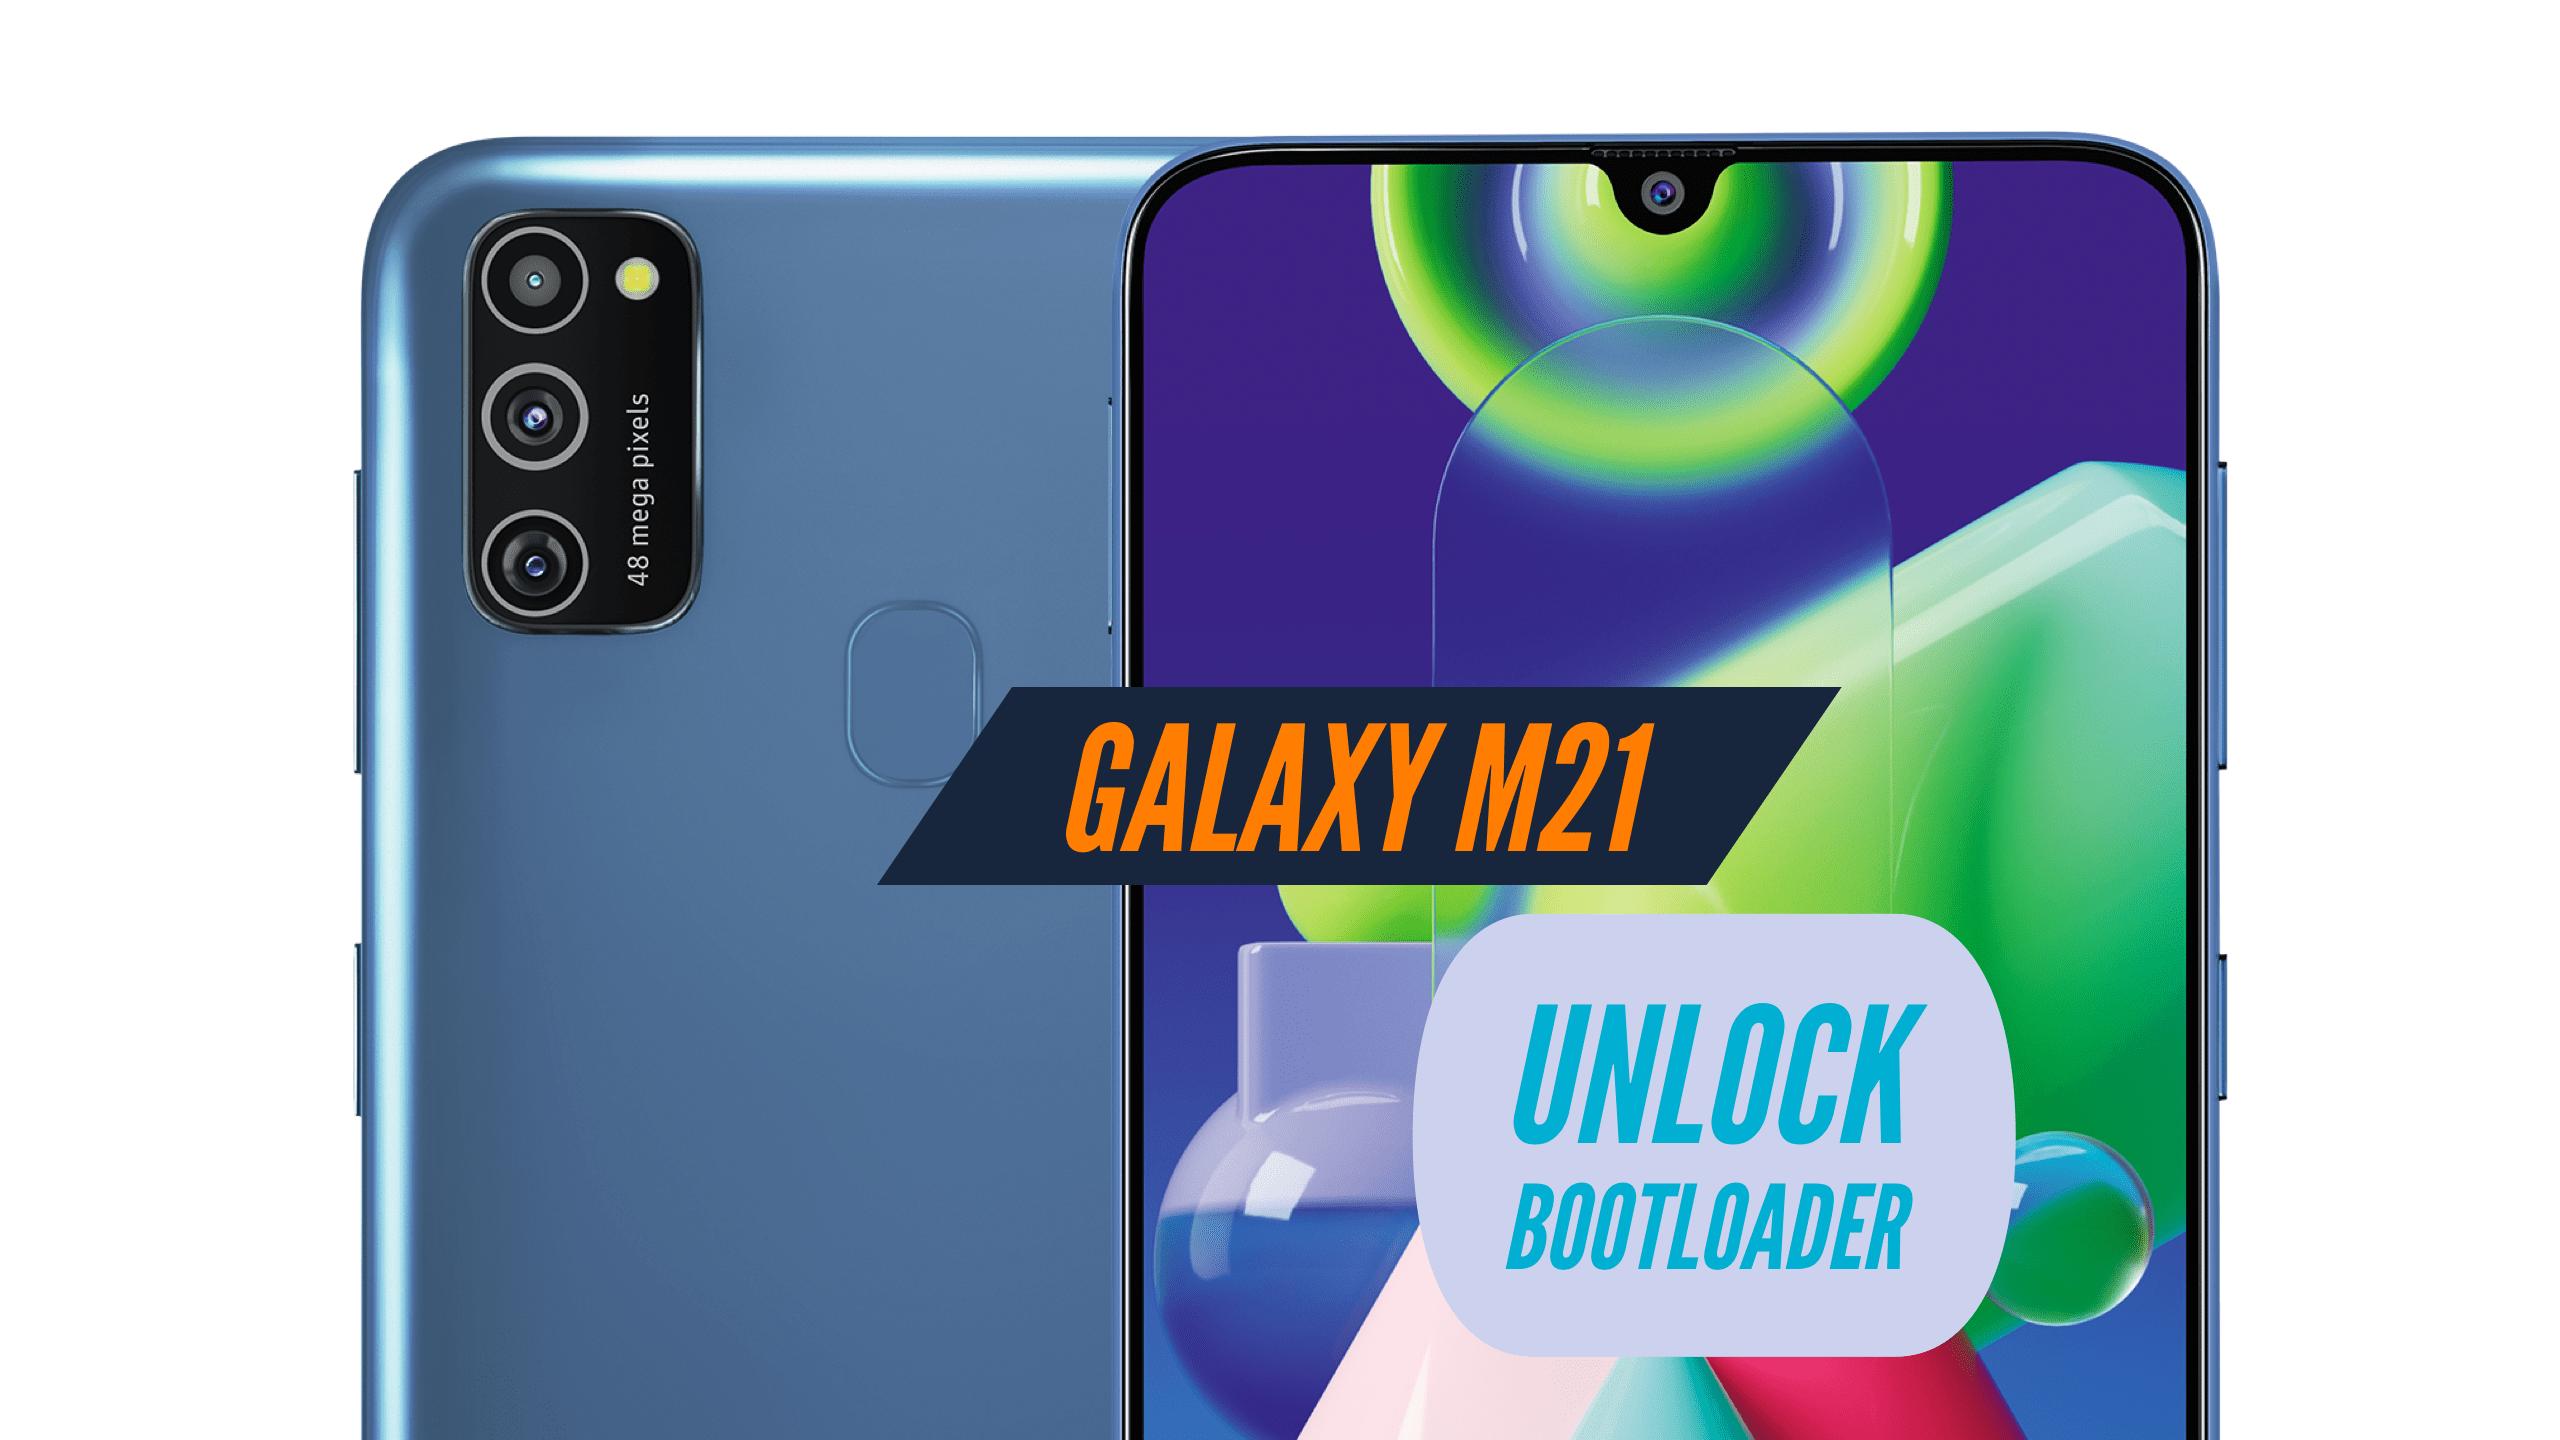 Unlock Bootloader Samsung Galaxy M21